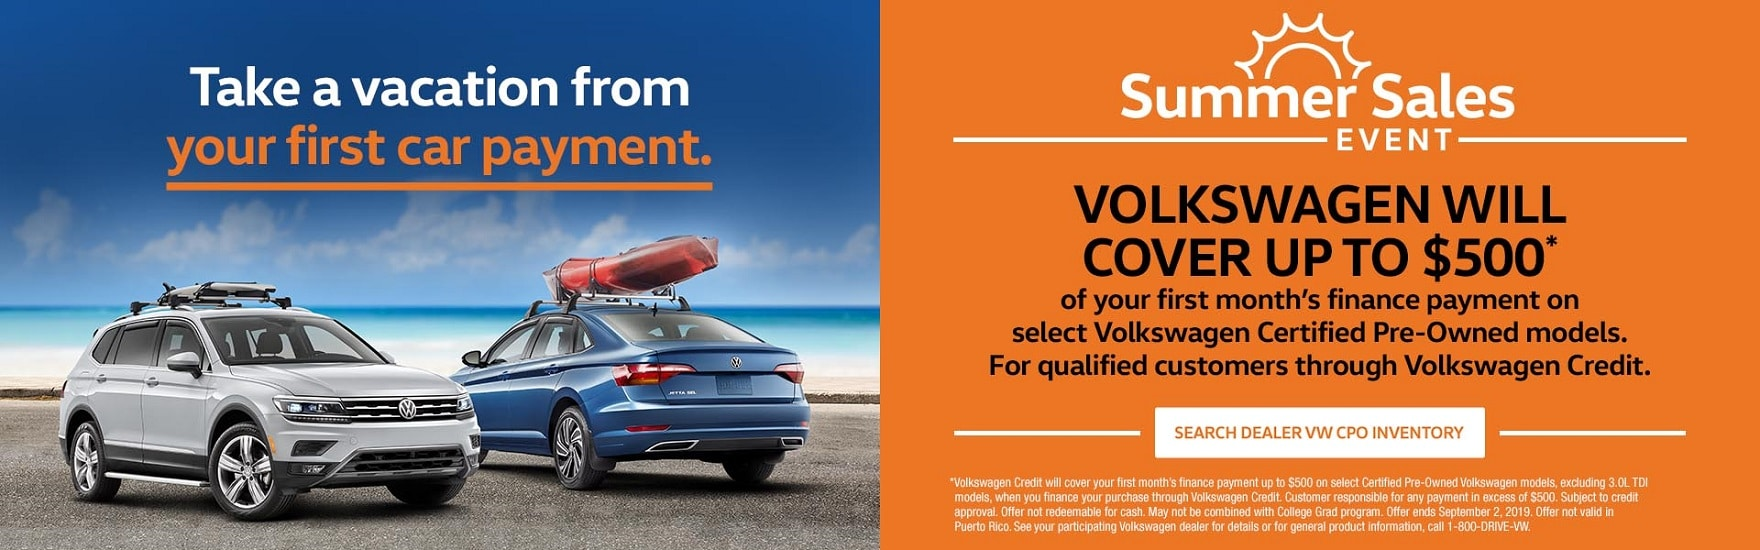 East Coast Vw >> Used Volkswagens For Sale Myrtle Beach Volkswagen Dealer